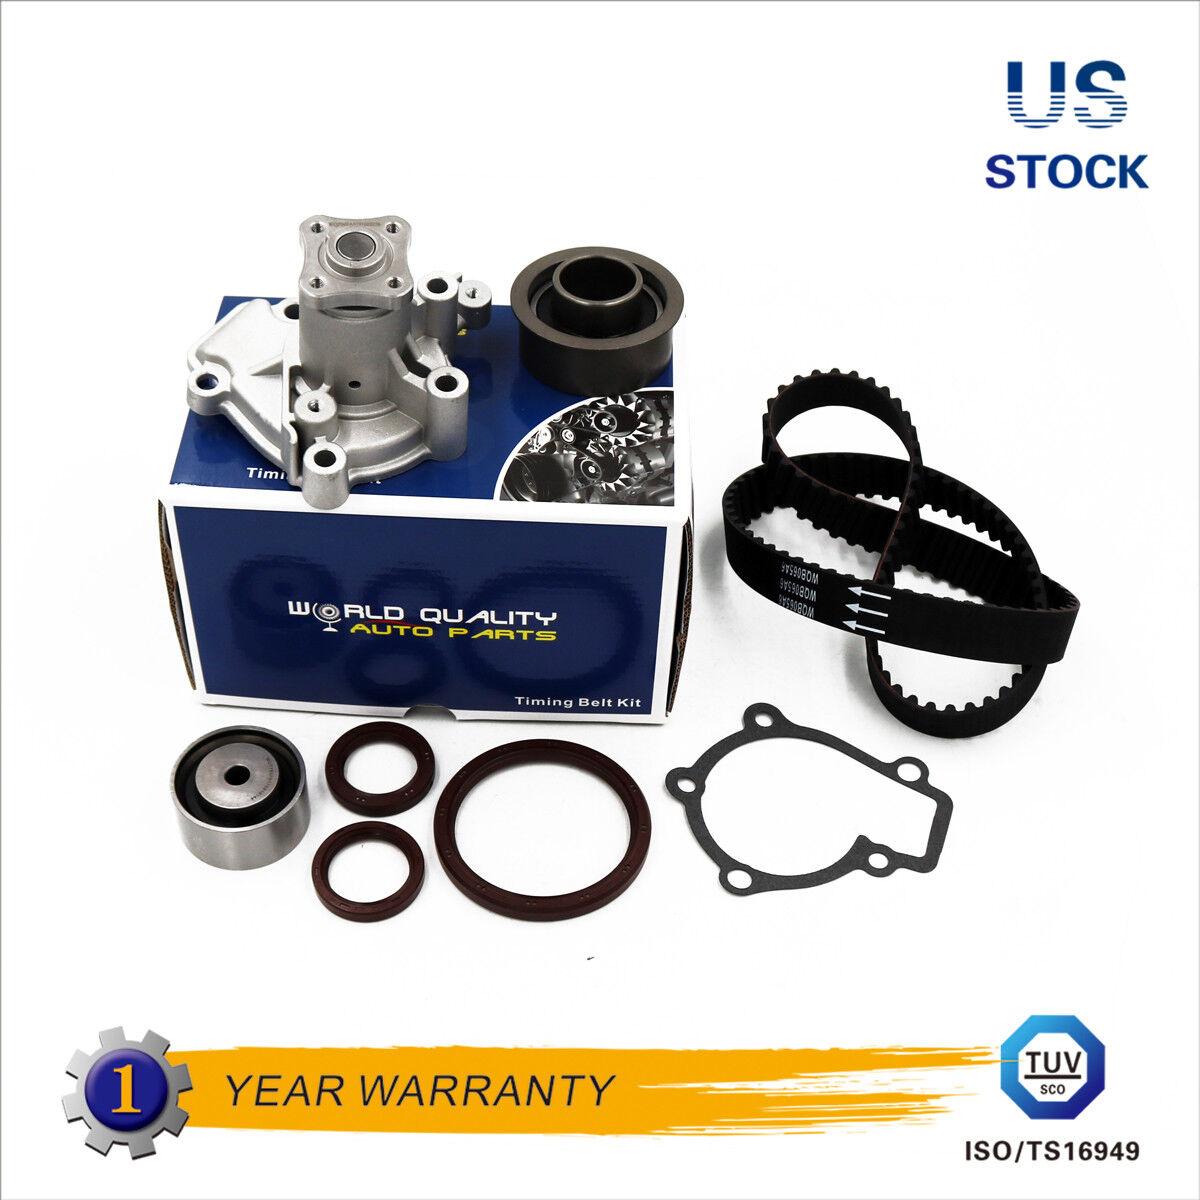 Details About Timing Belt Water Pump Kit For 1997 2008 Hyundai Elantra Kia G4gf Engine 2 0 16v